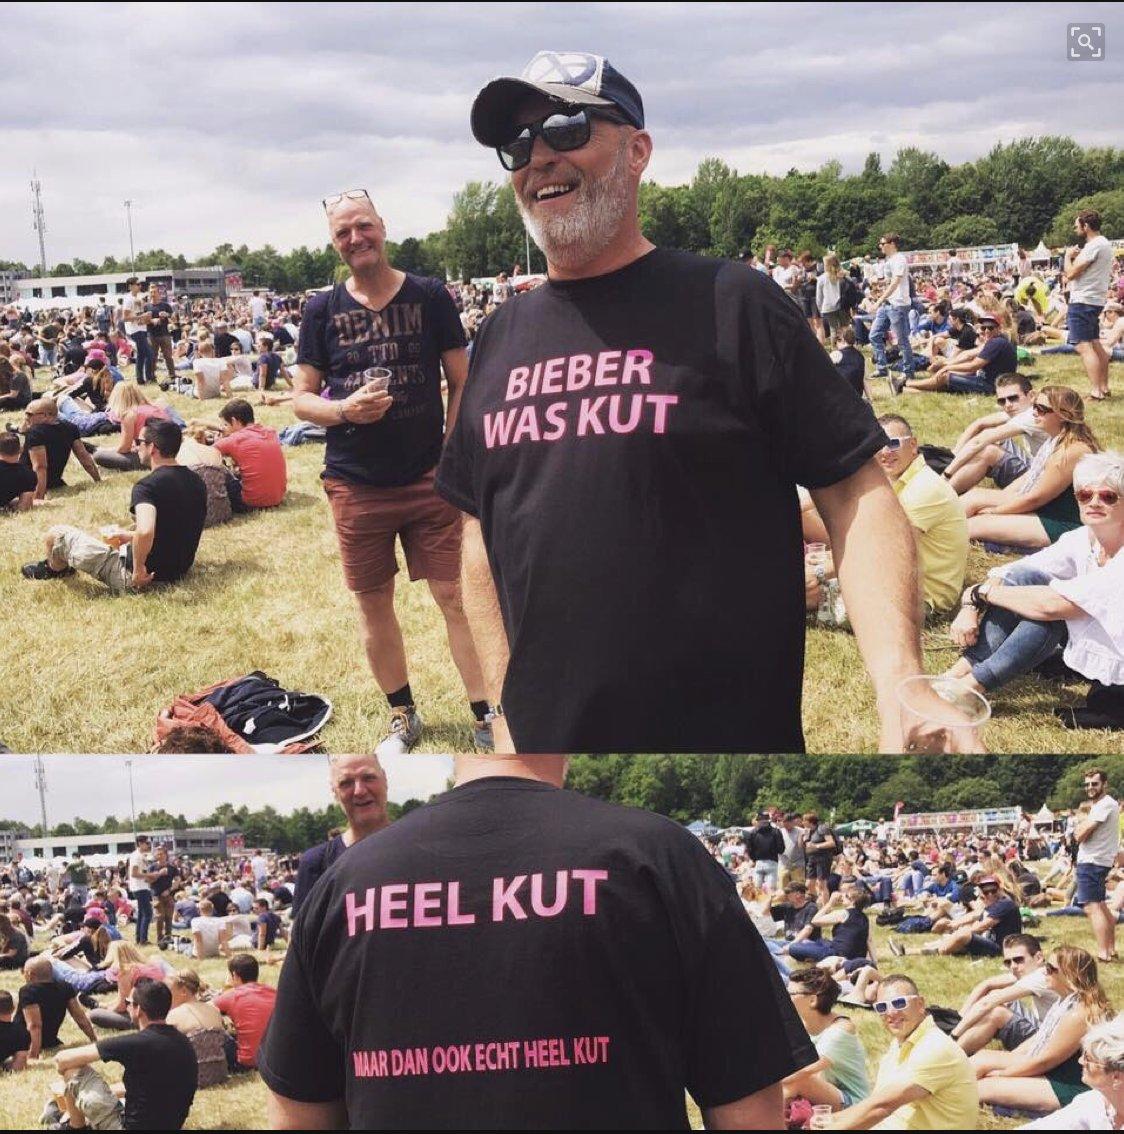 Geloof dat we iets leuks hebben gemist #pinkpop #PinkPopFestival justin, via @SterkNikki https://t.co/wpc01v3eM2